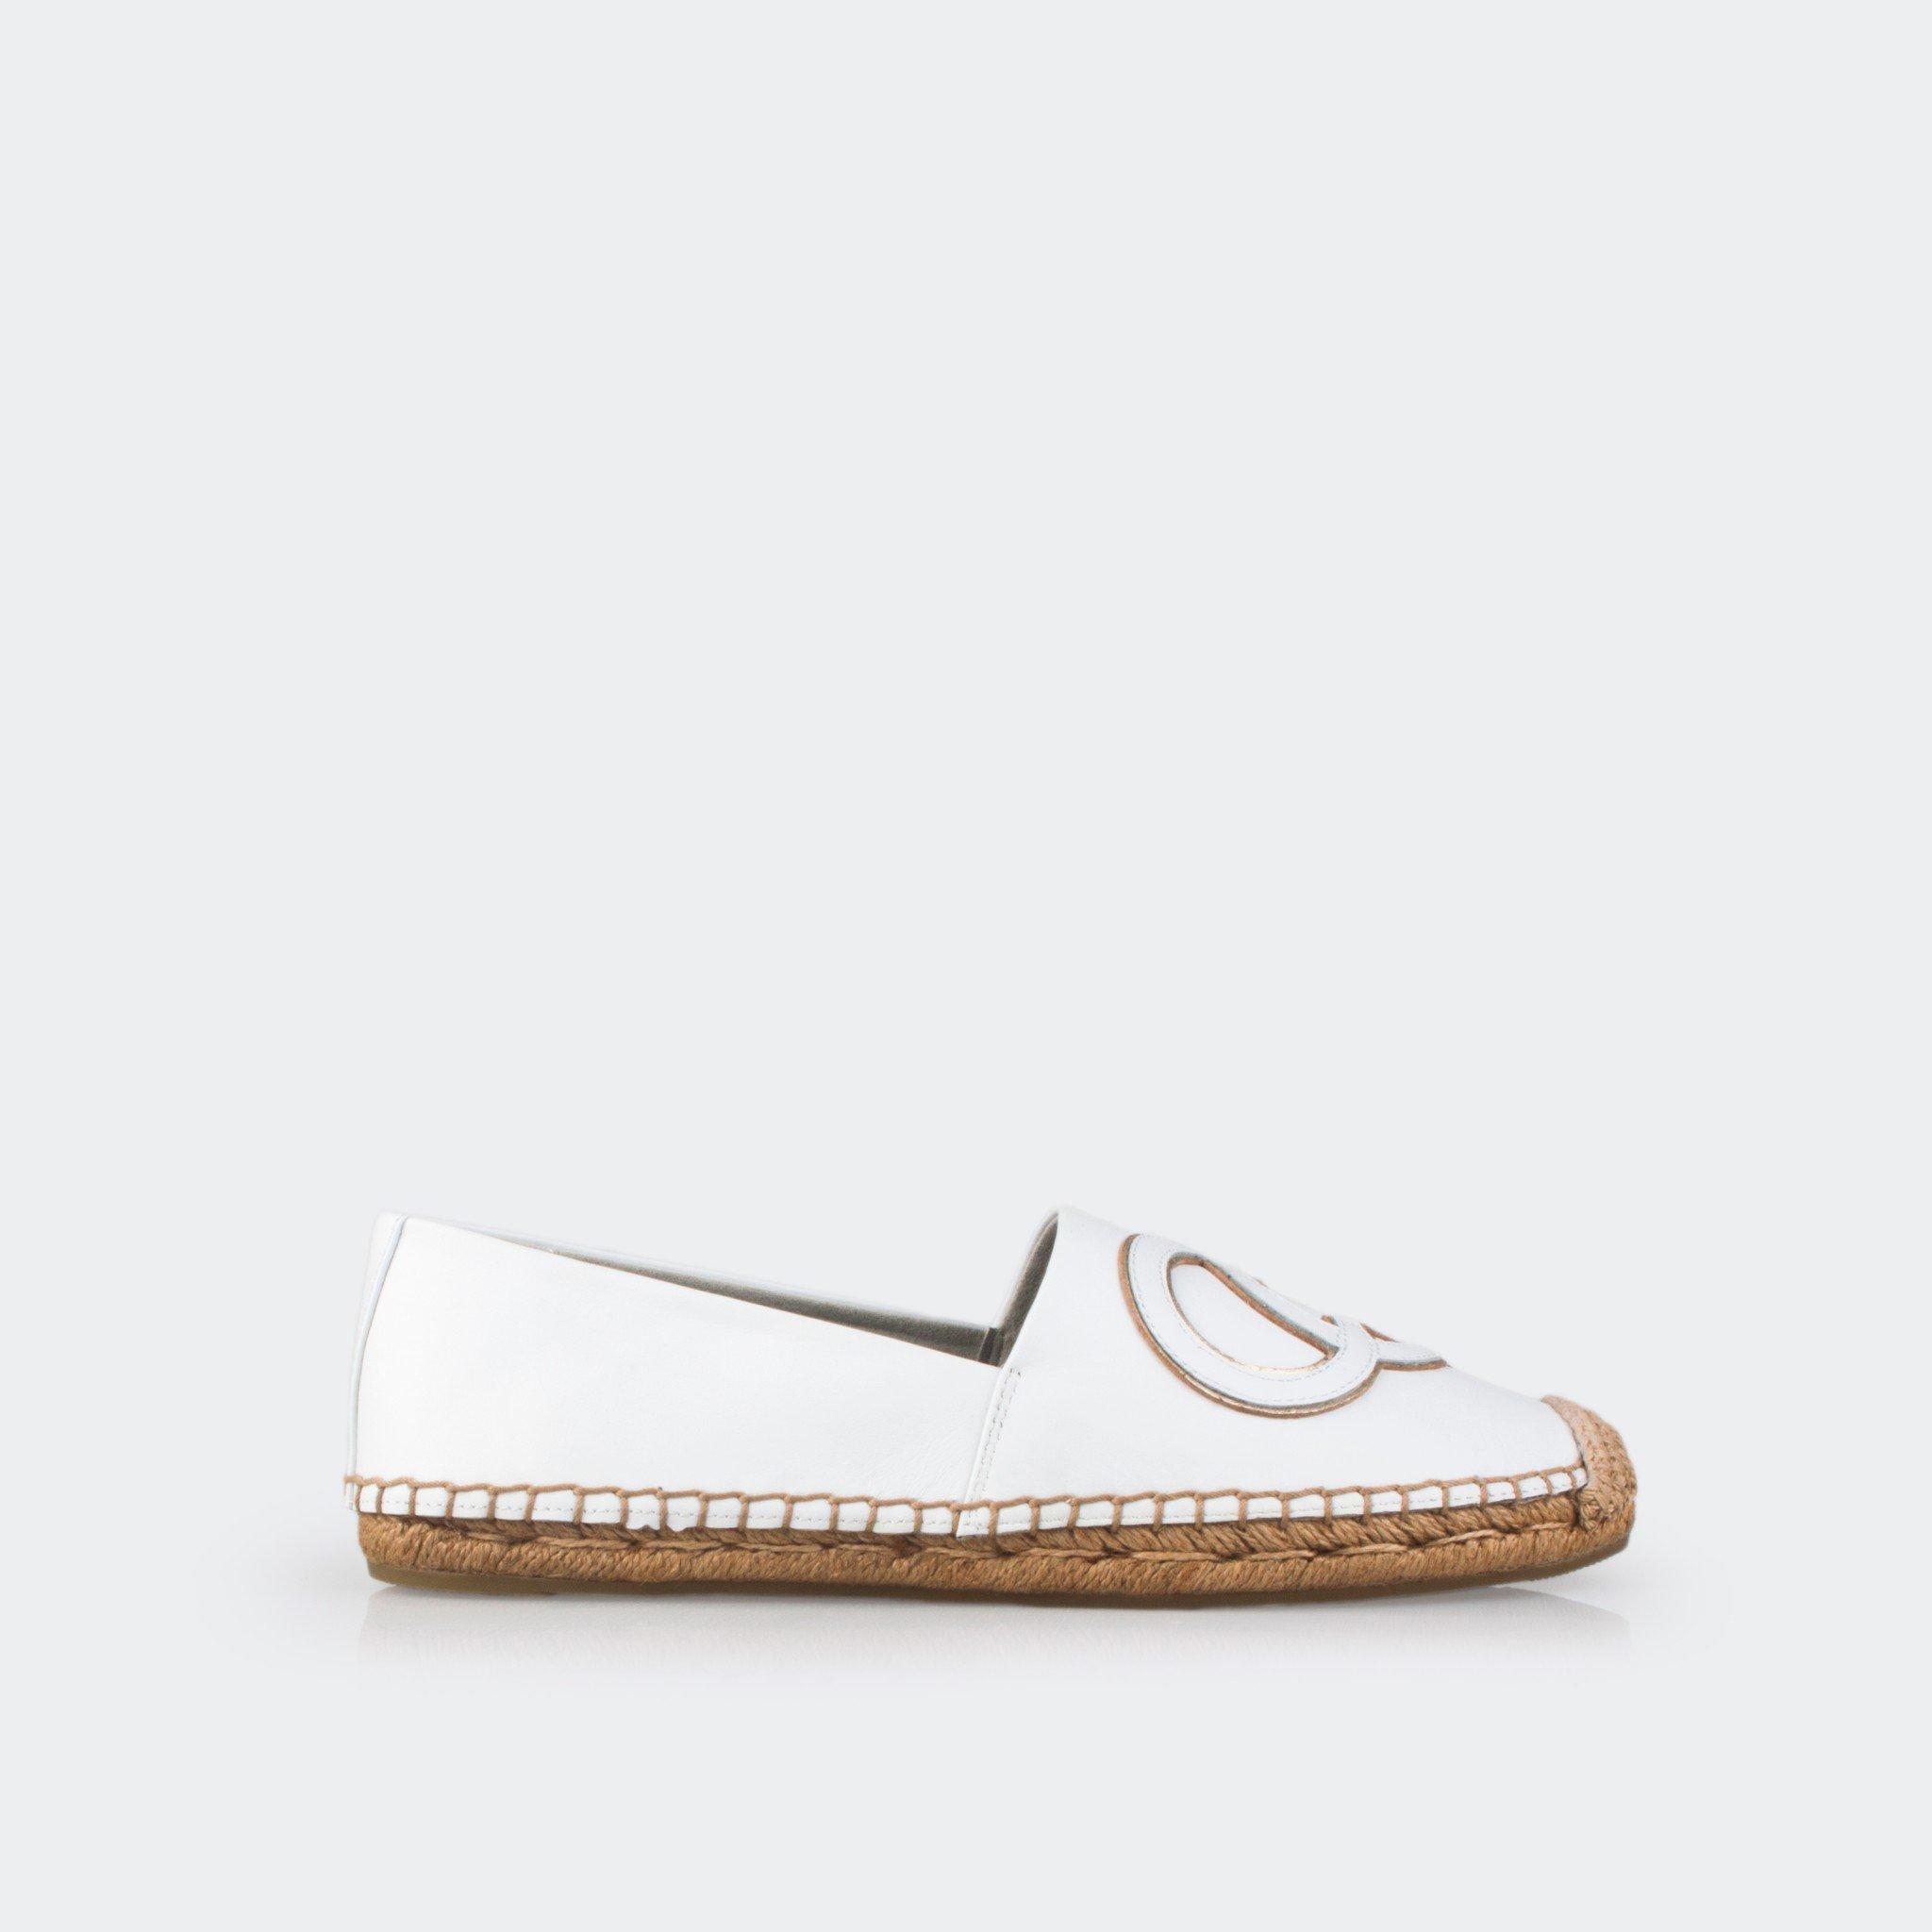 GBB143TRADA - Giày búp bê